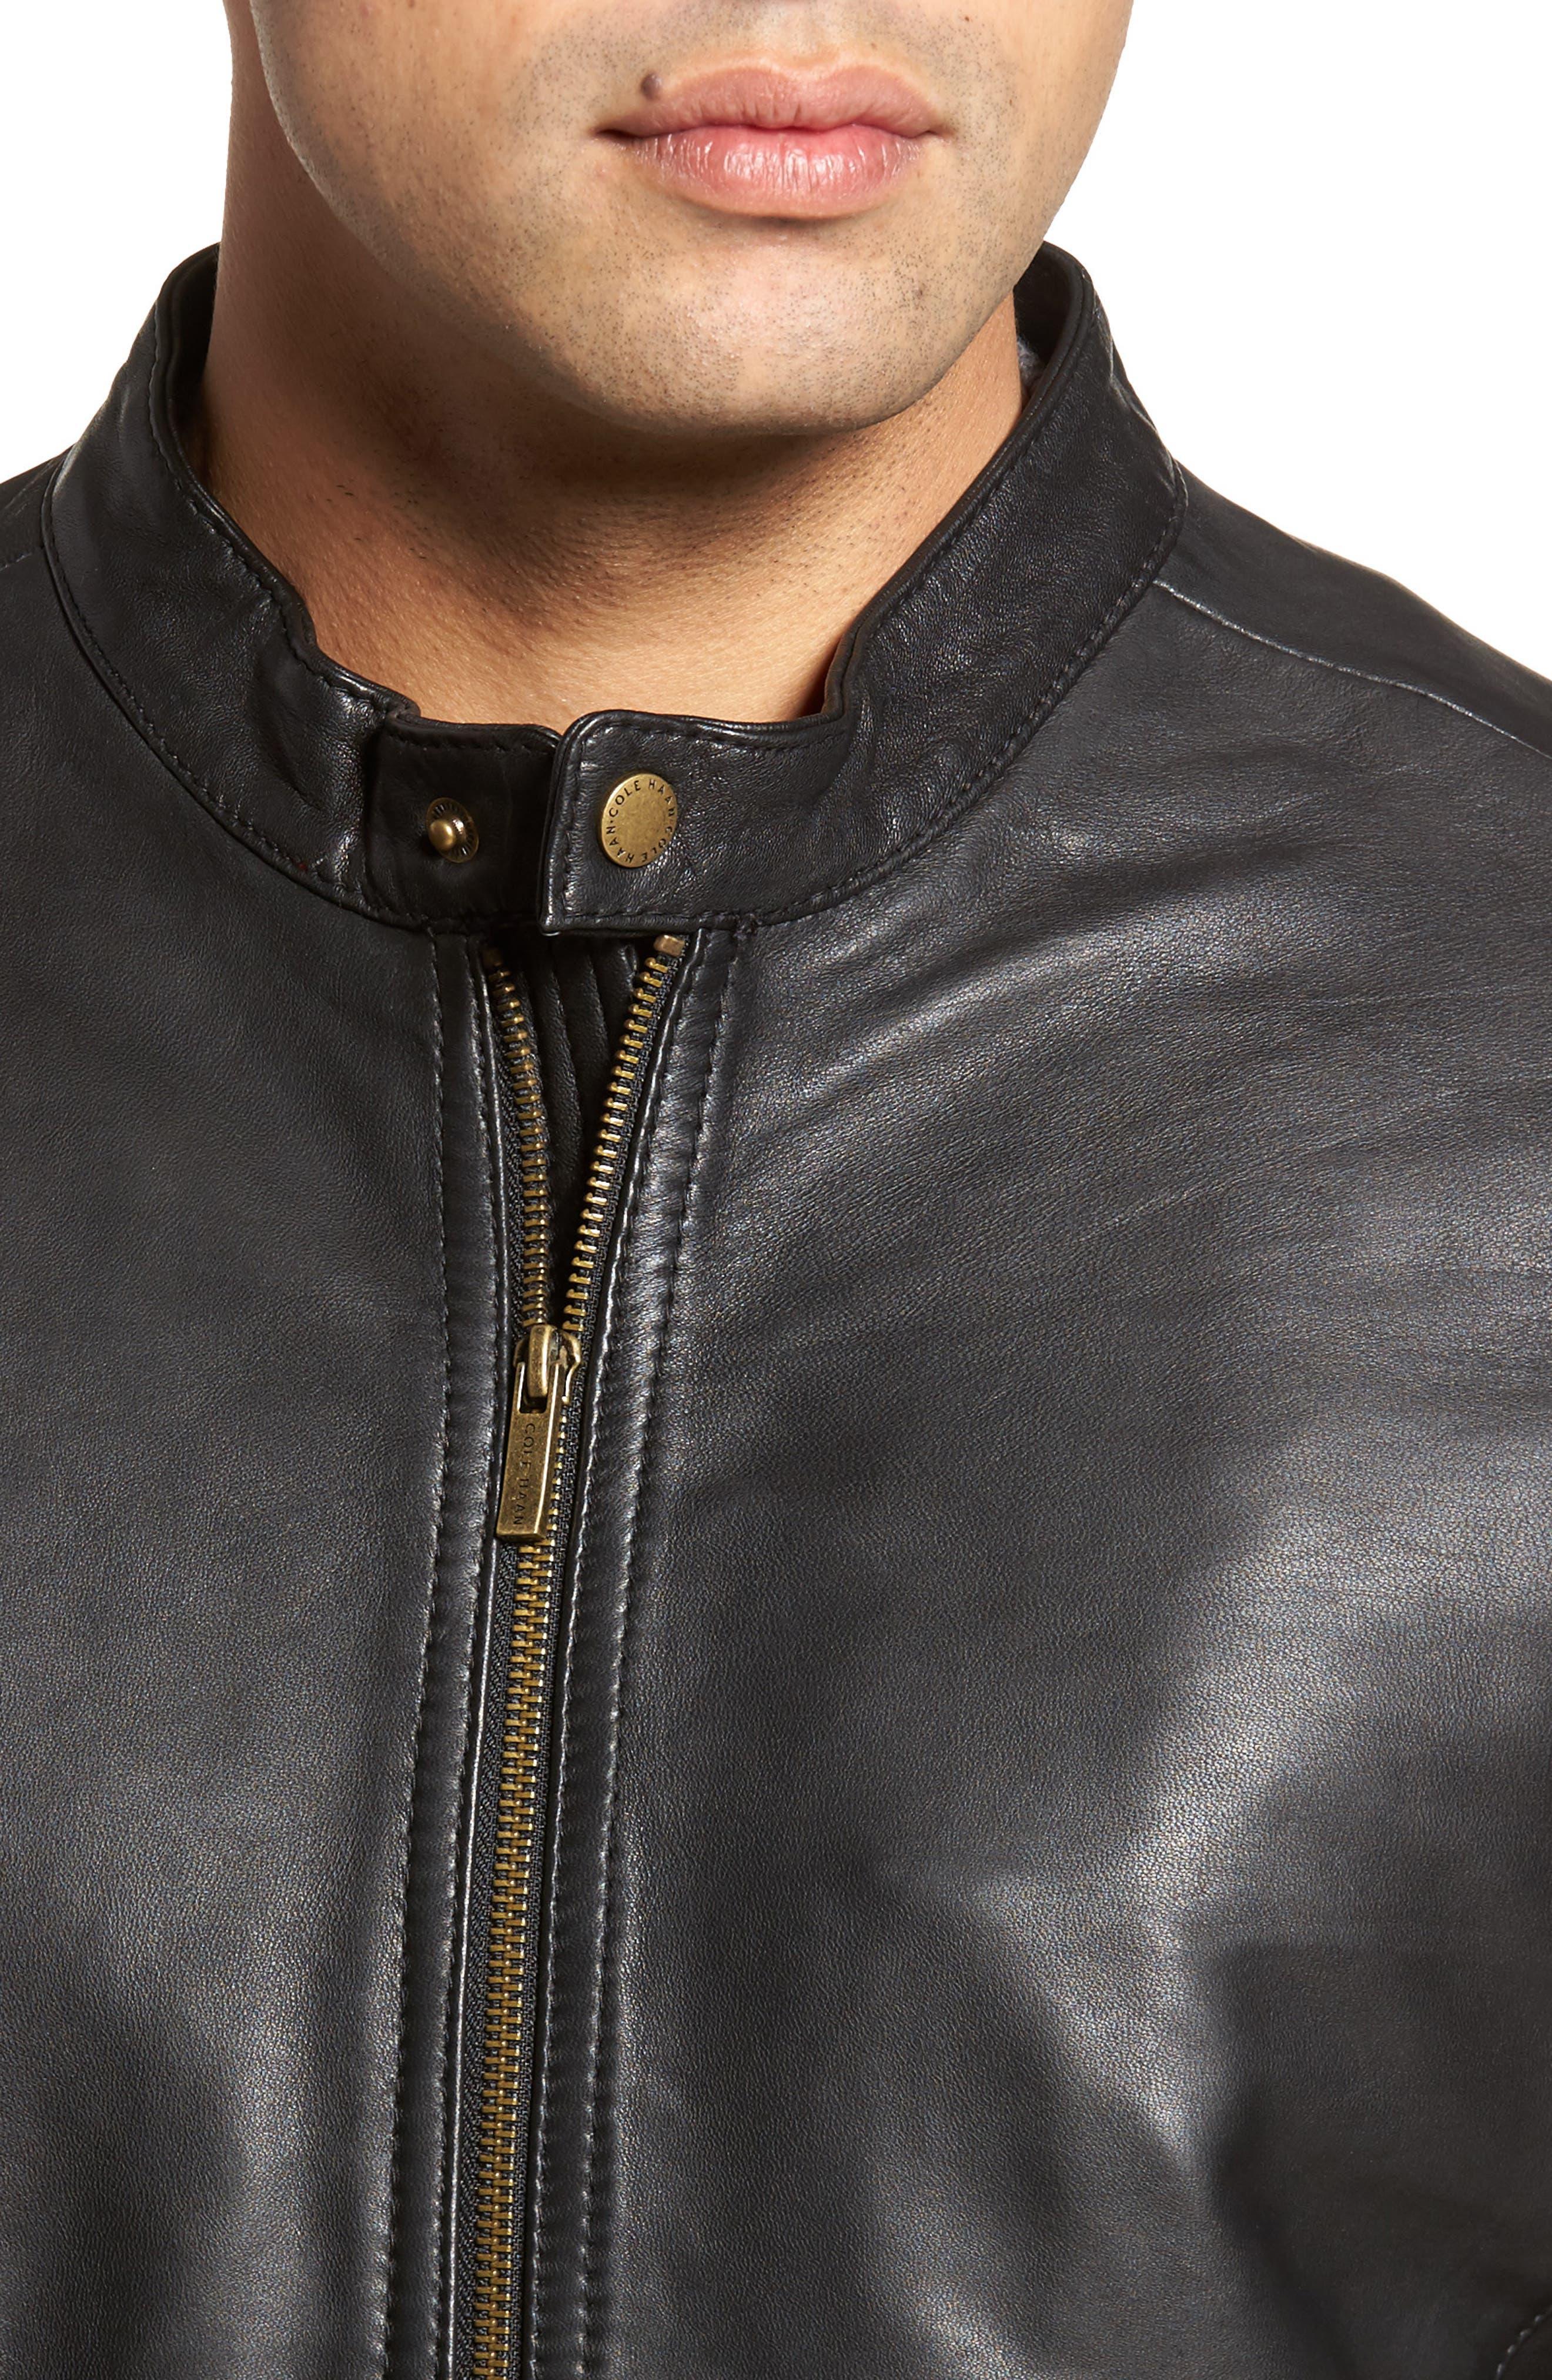 COLE HAAN, Lambskin Leather Moto Jacket, Alternate thumbnail 5, color, 001